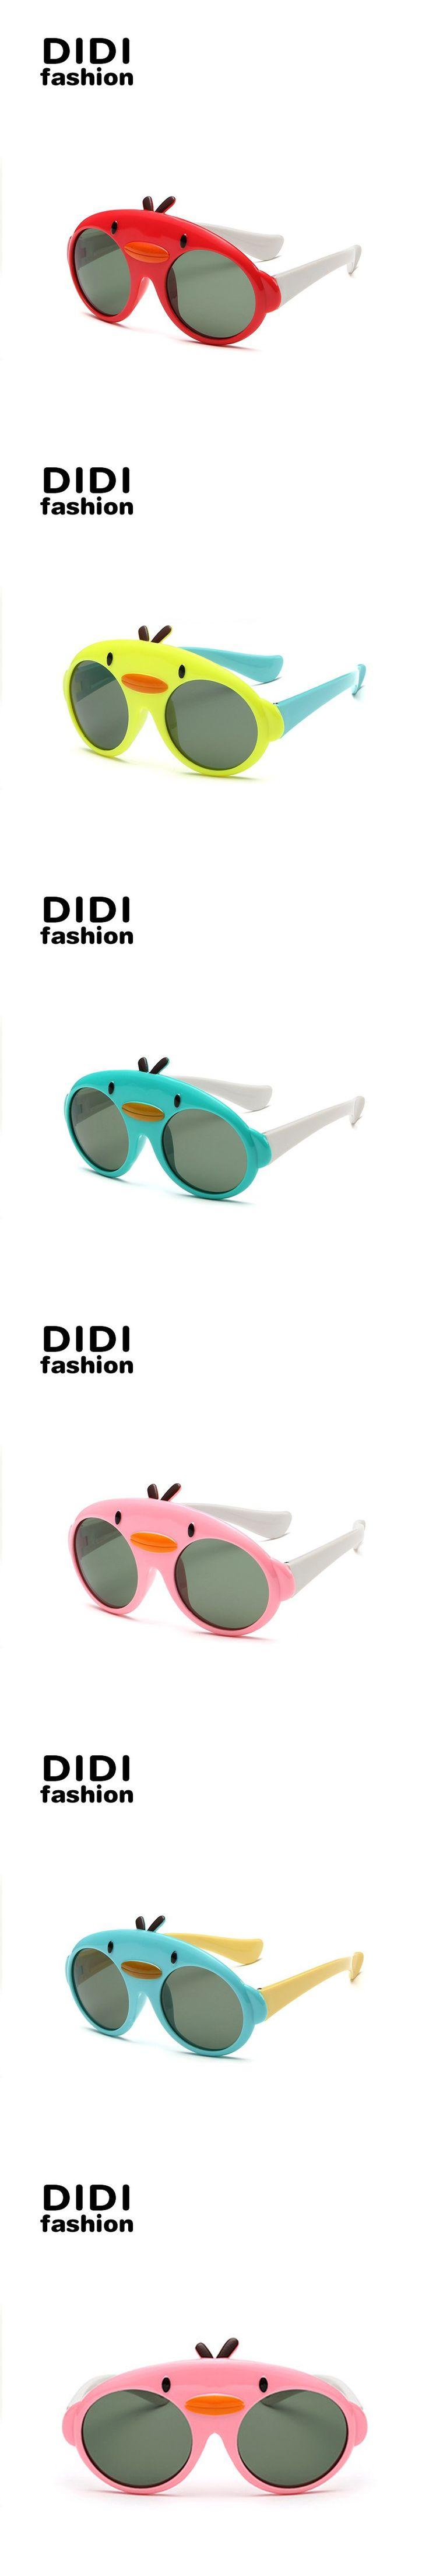 DIDI Polarized Round Kids Sunglasses Children New Cute Girls Boys Outdoor Eyewear Cool Cartoon Brand Shades Oculos De Grau C403